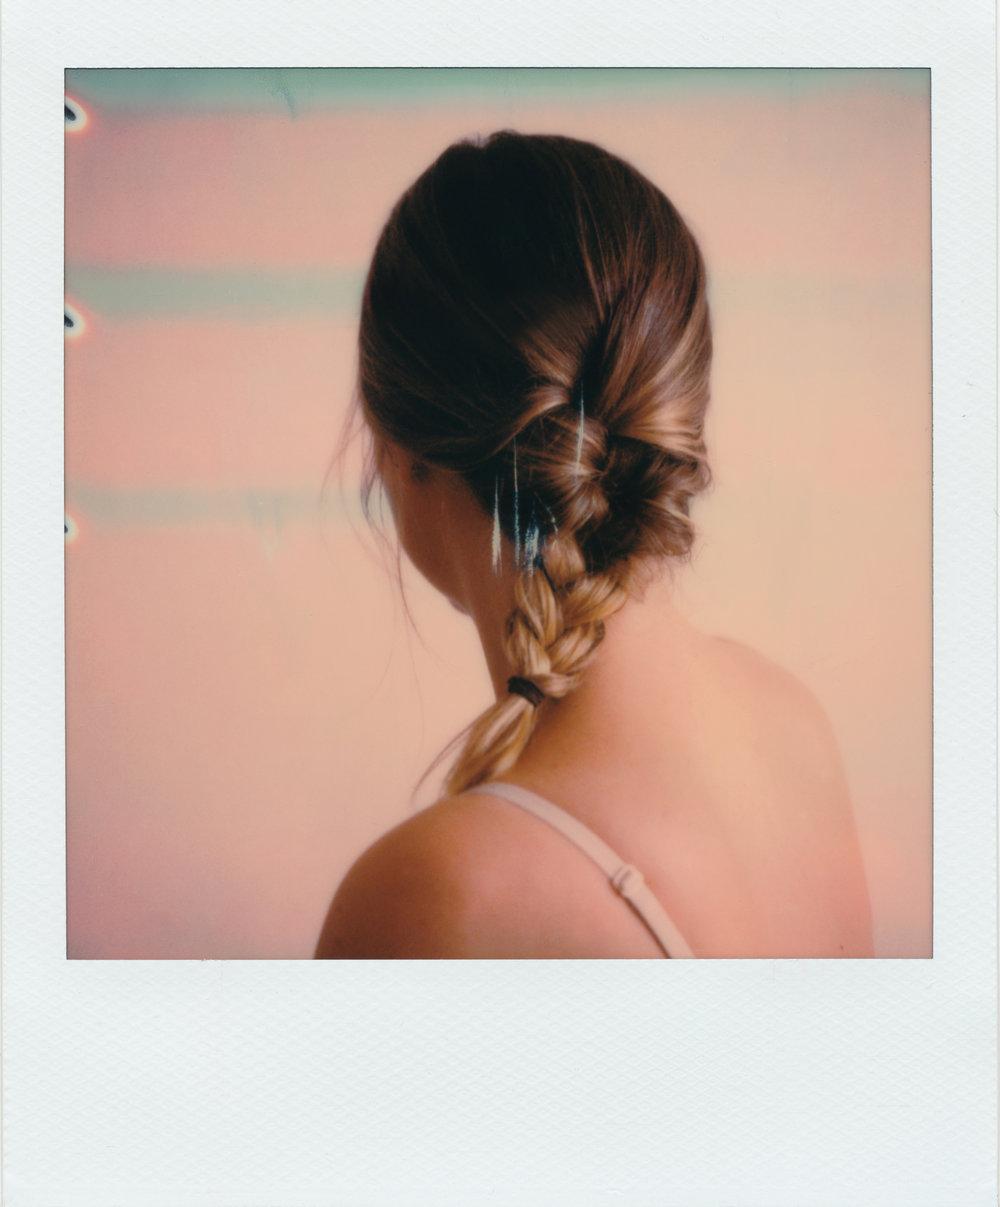 Jennifer_Rumbach_Polaroids_Porto_2.jpg